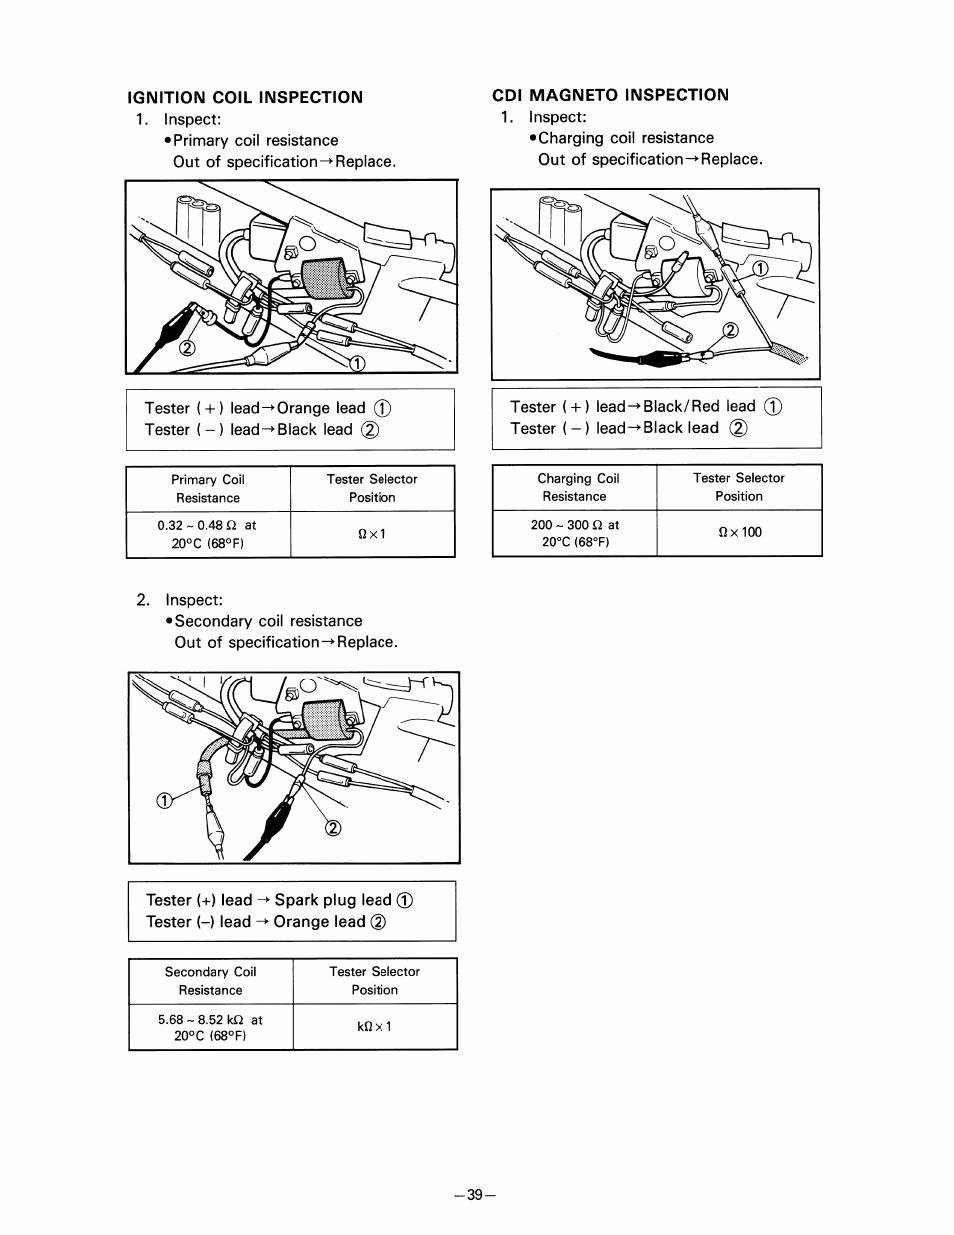 ignition coil inspection cdi magneto inspection yamaha pw80 user rh manualsdir com